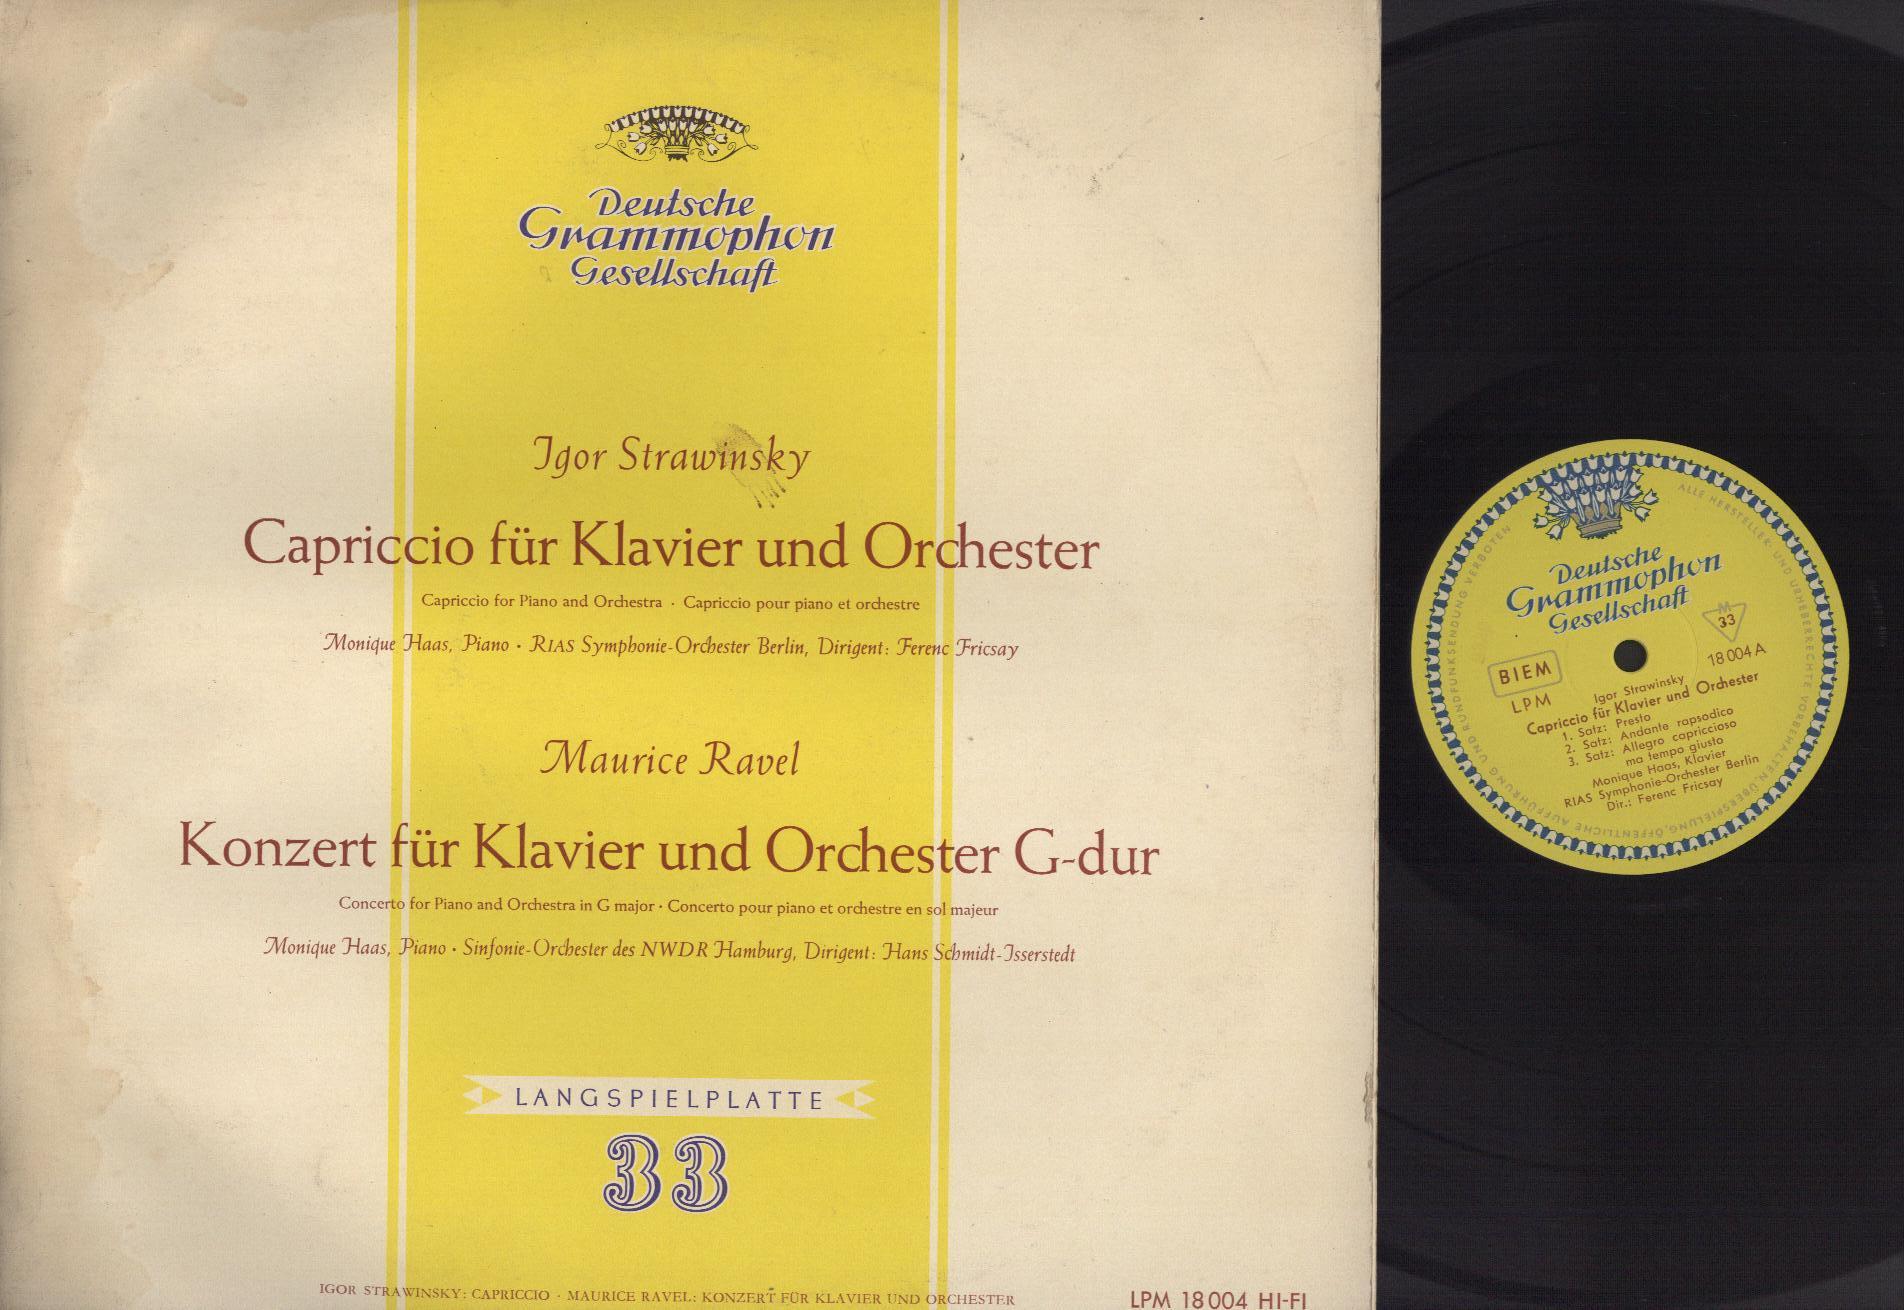 Igor Stravinsky, Monique Haas, RIAS Symphonie-Orch Capriccio für Klavier und Orchester, Konzert für Klavier und Orchester G-dur